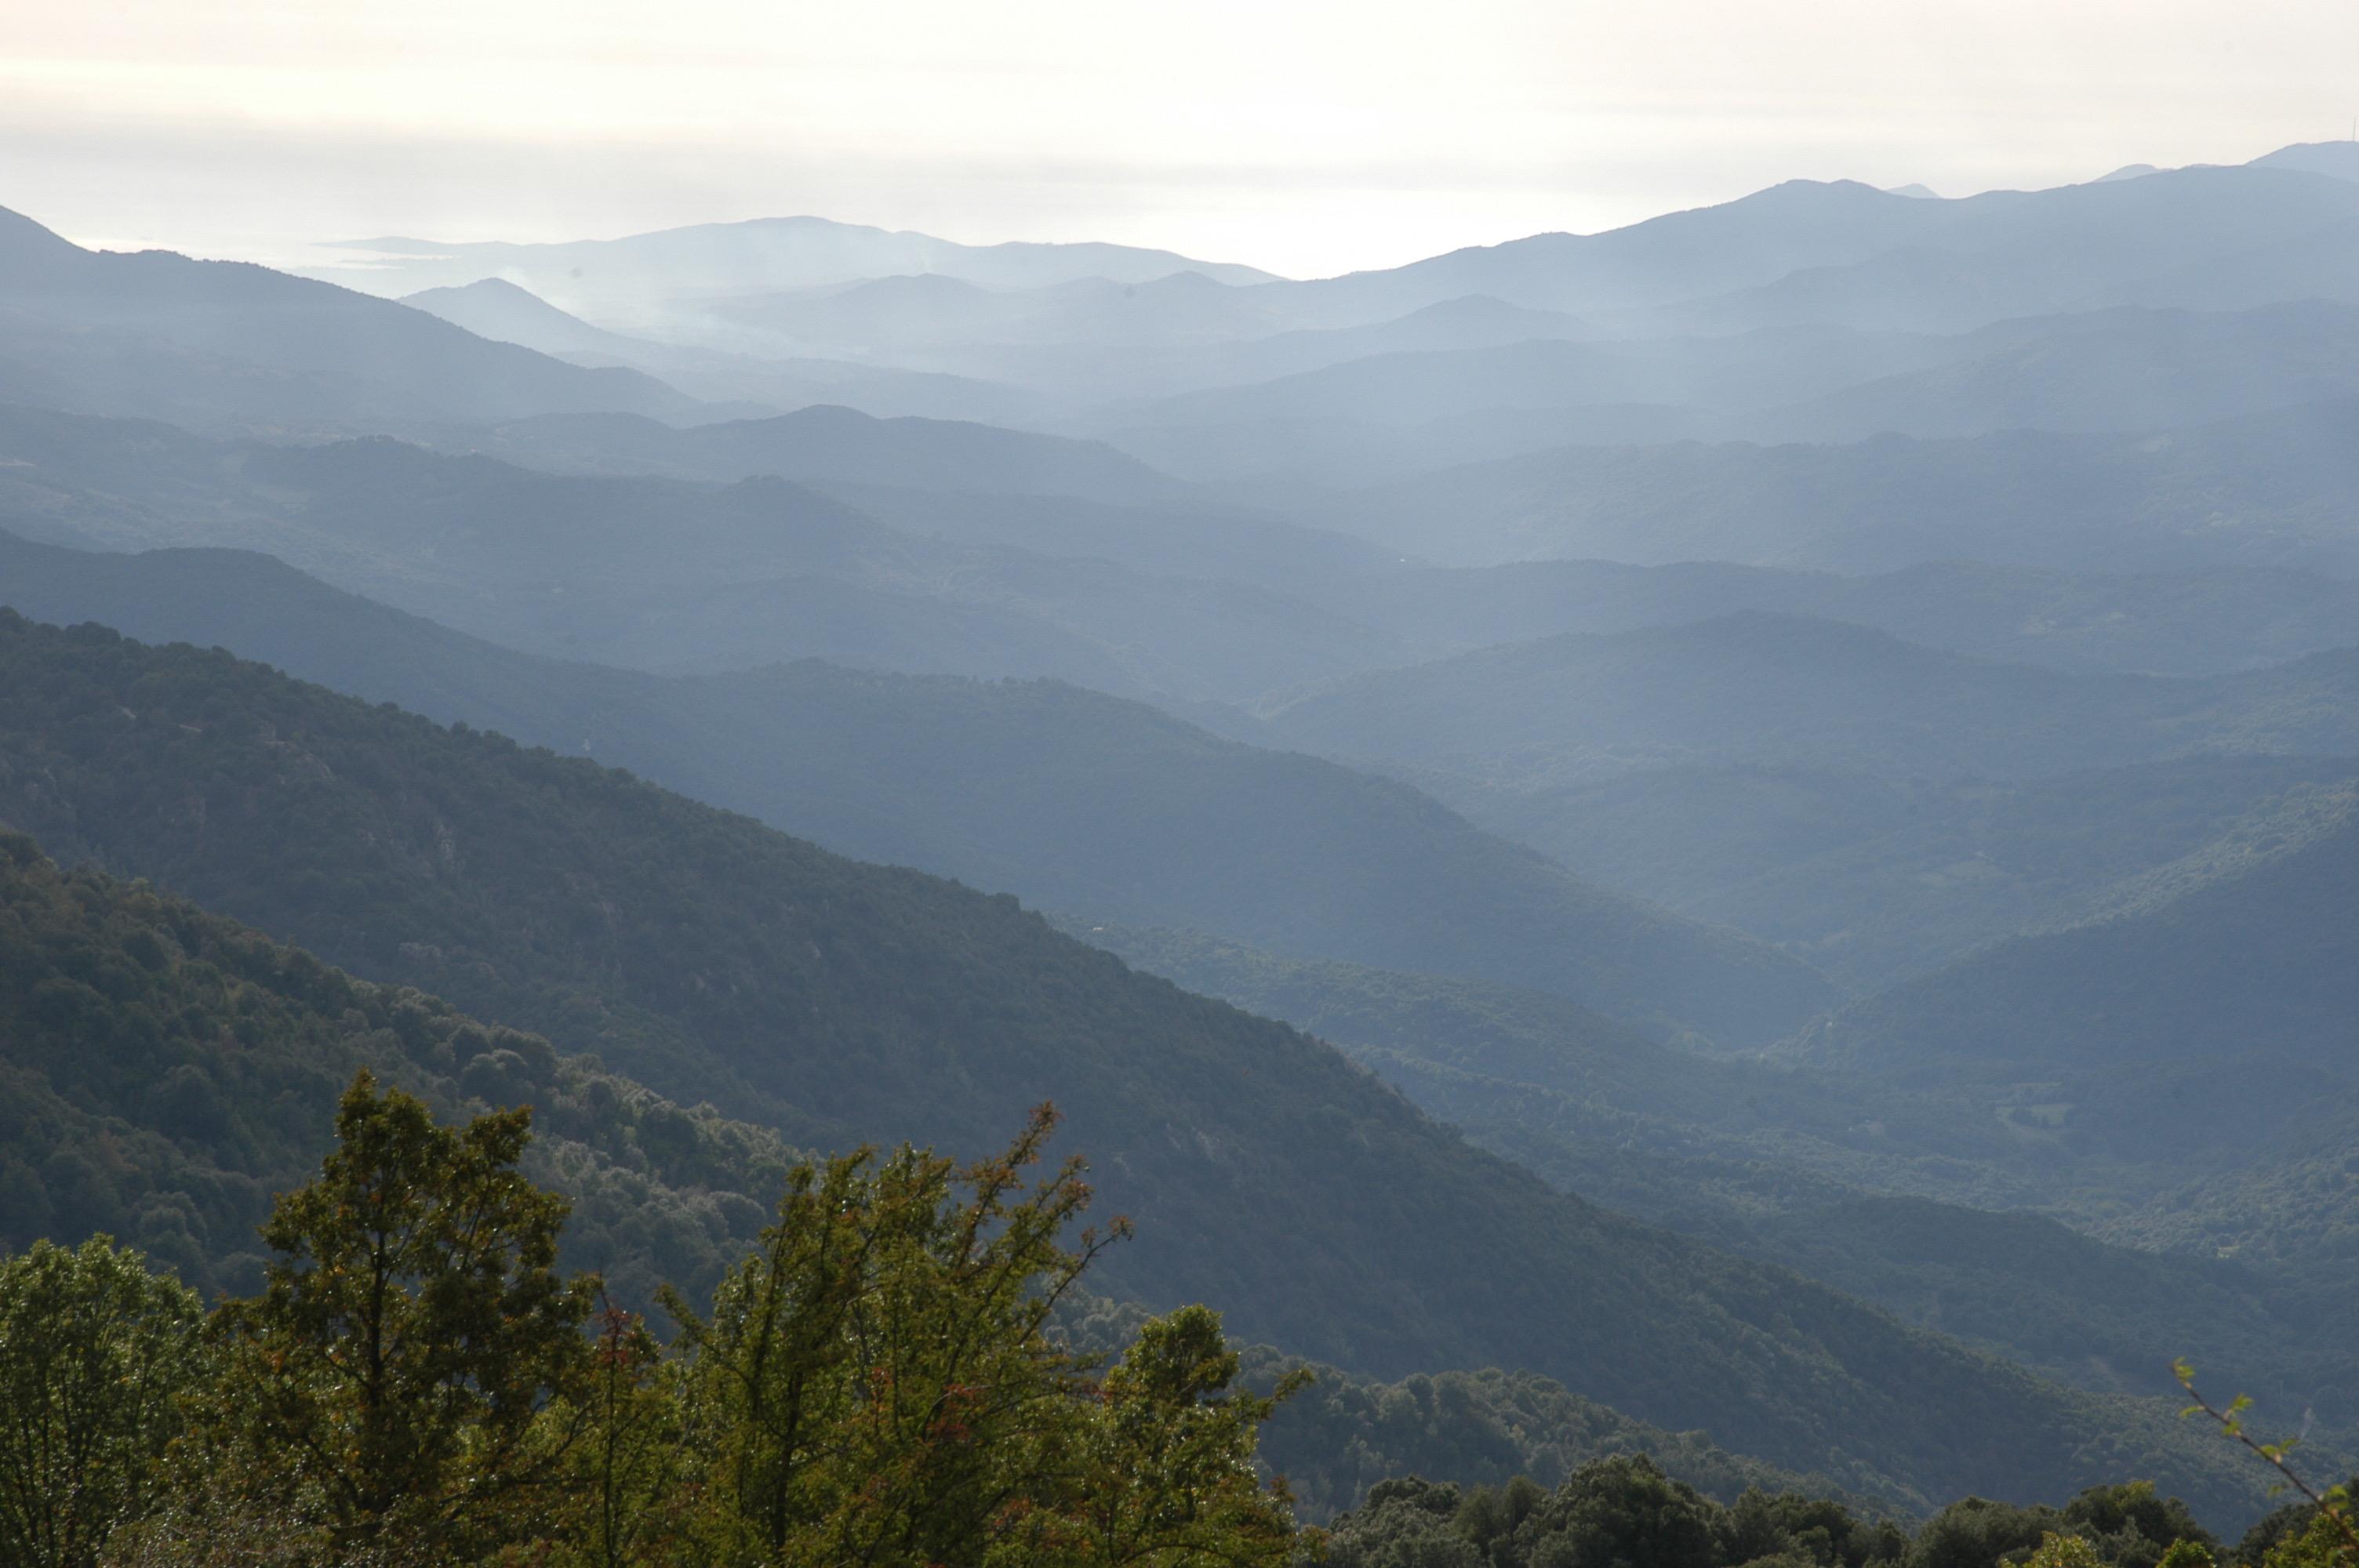 La vallée du Taravo avec Porto polo an fond Plateau du coscione Zicavo Thierry senlis ( famille Leccia)